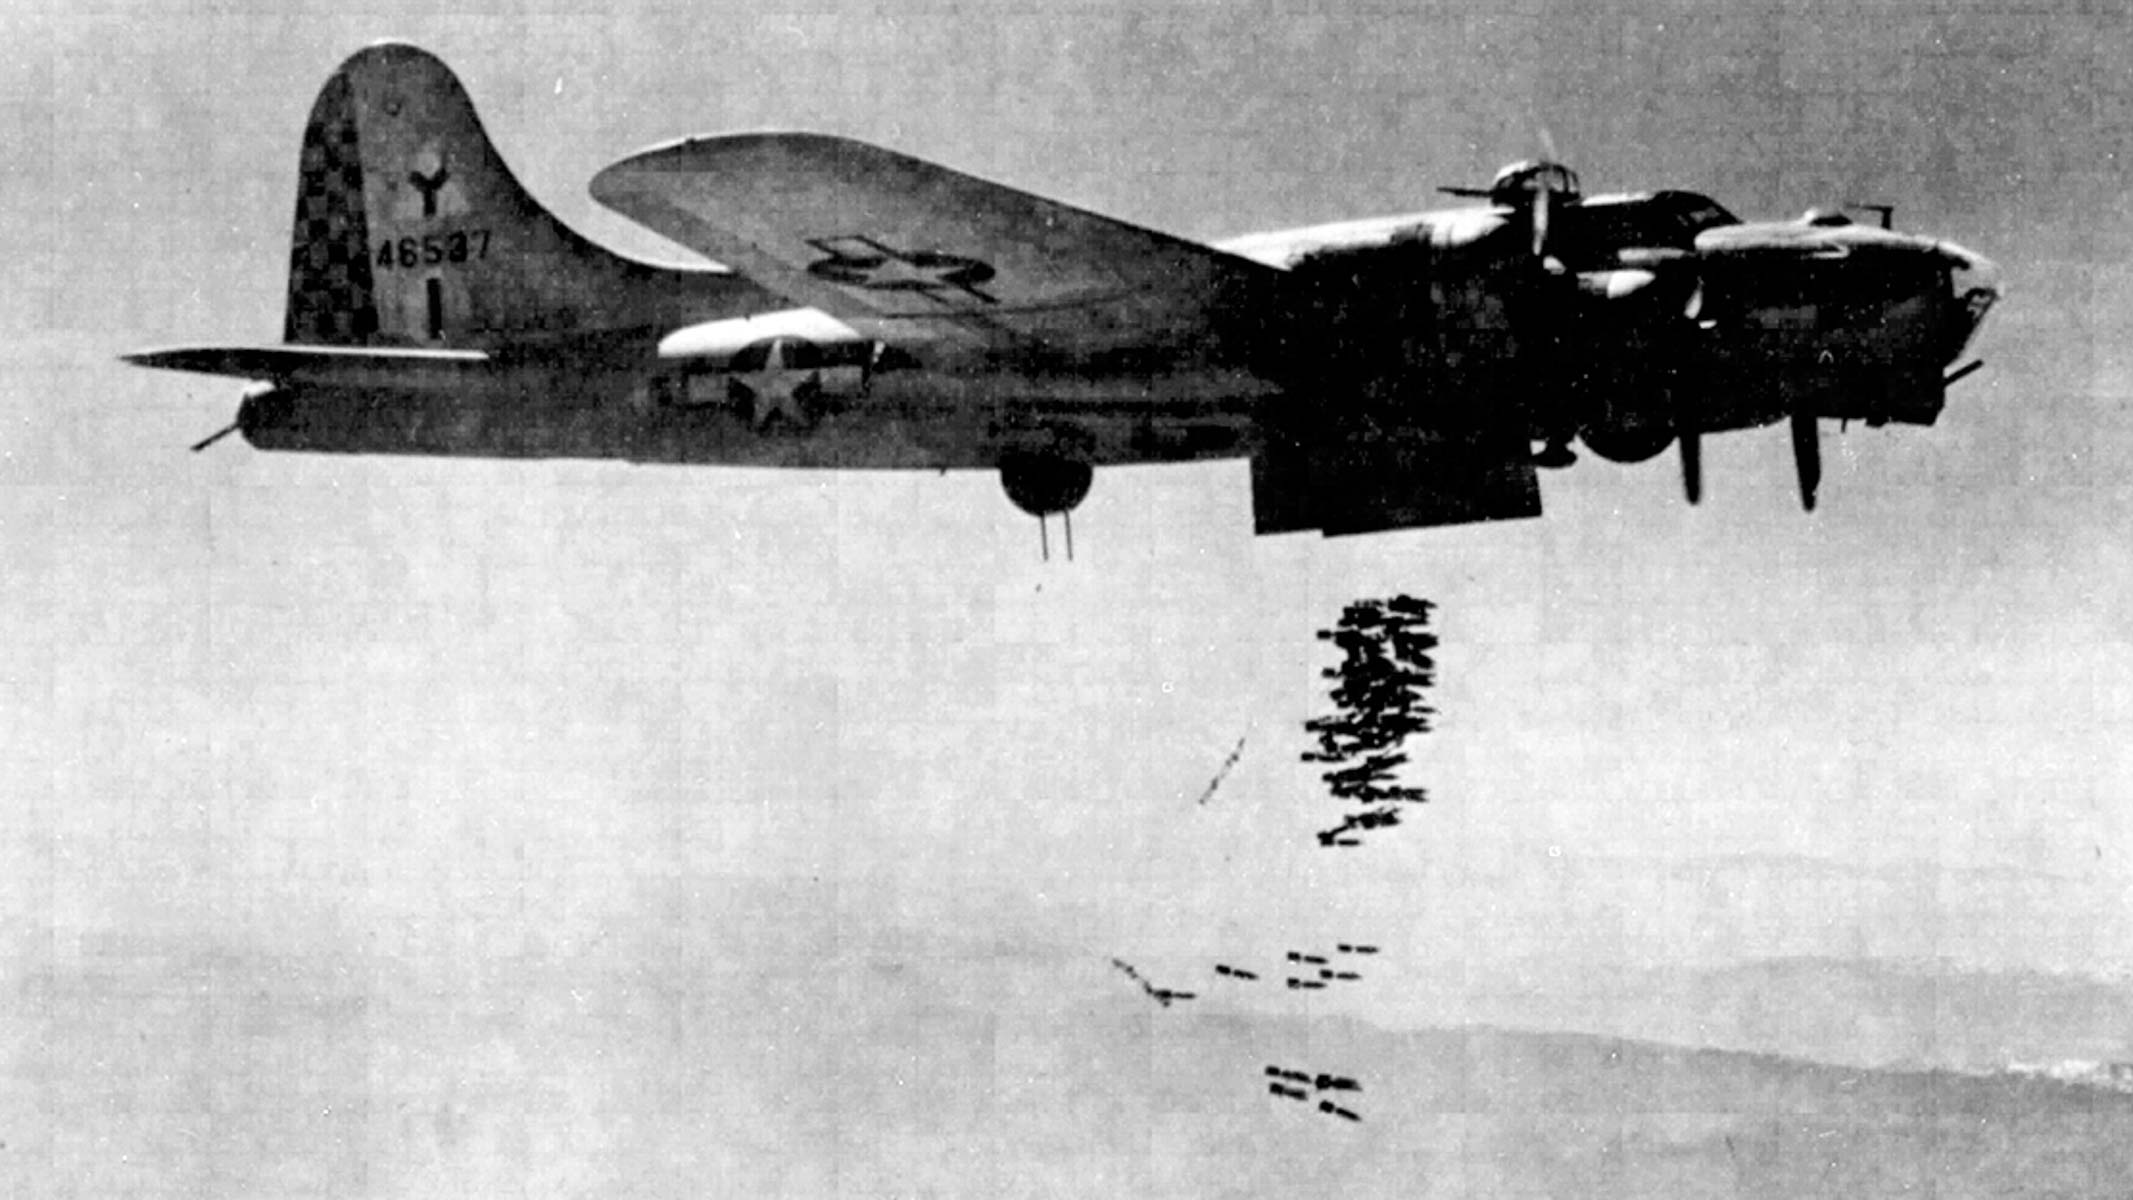 B-17 of 341st Squadron